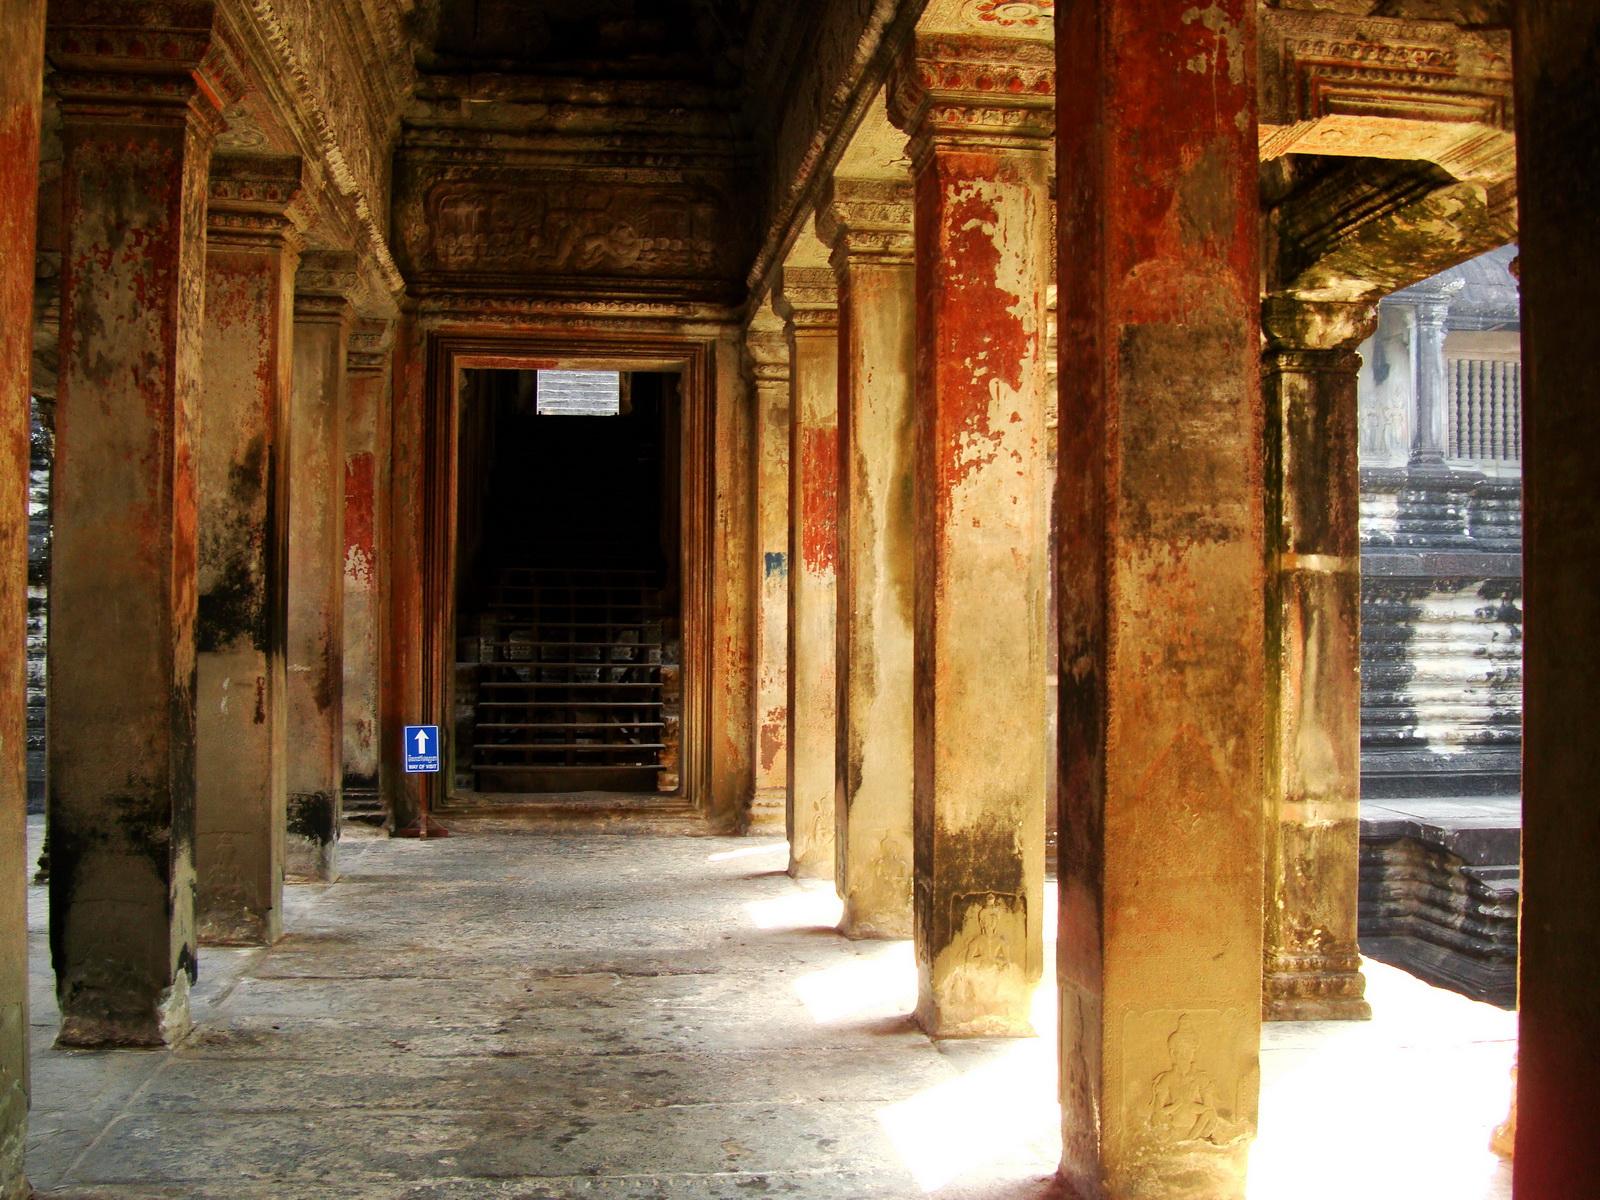 Angkor Wat inner sanctuary gallery columns and passageways 10